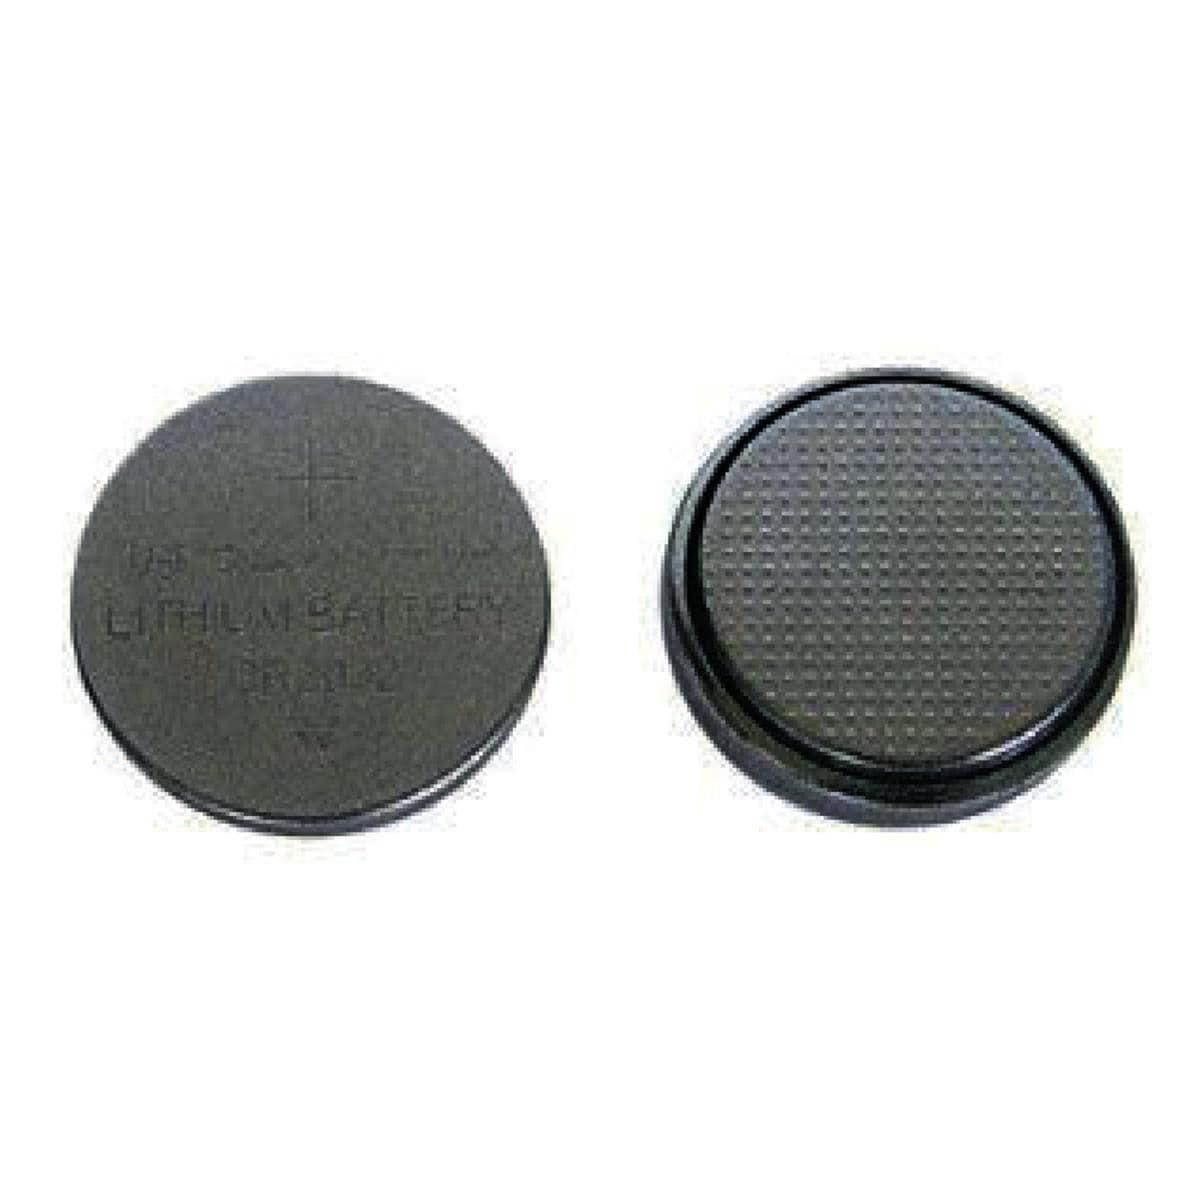 Battery CR2032, single